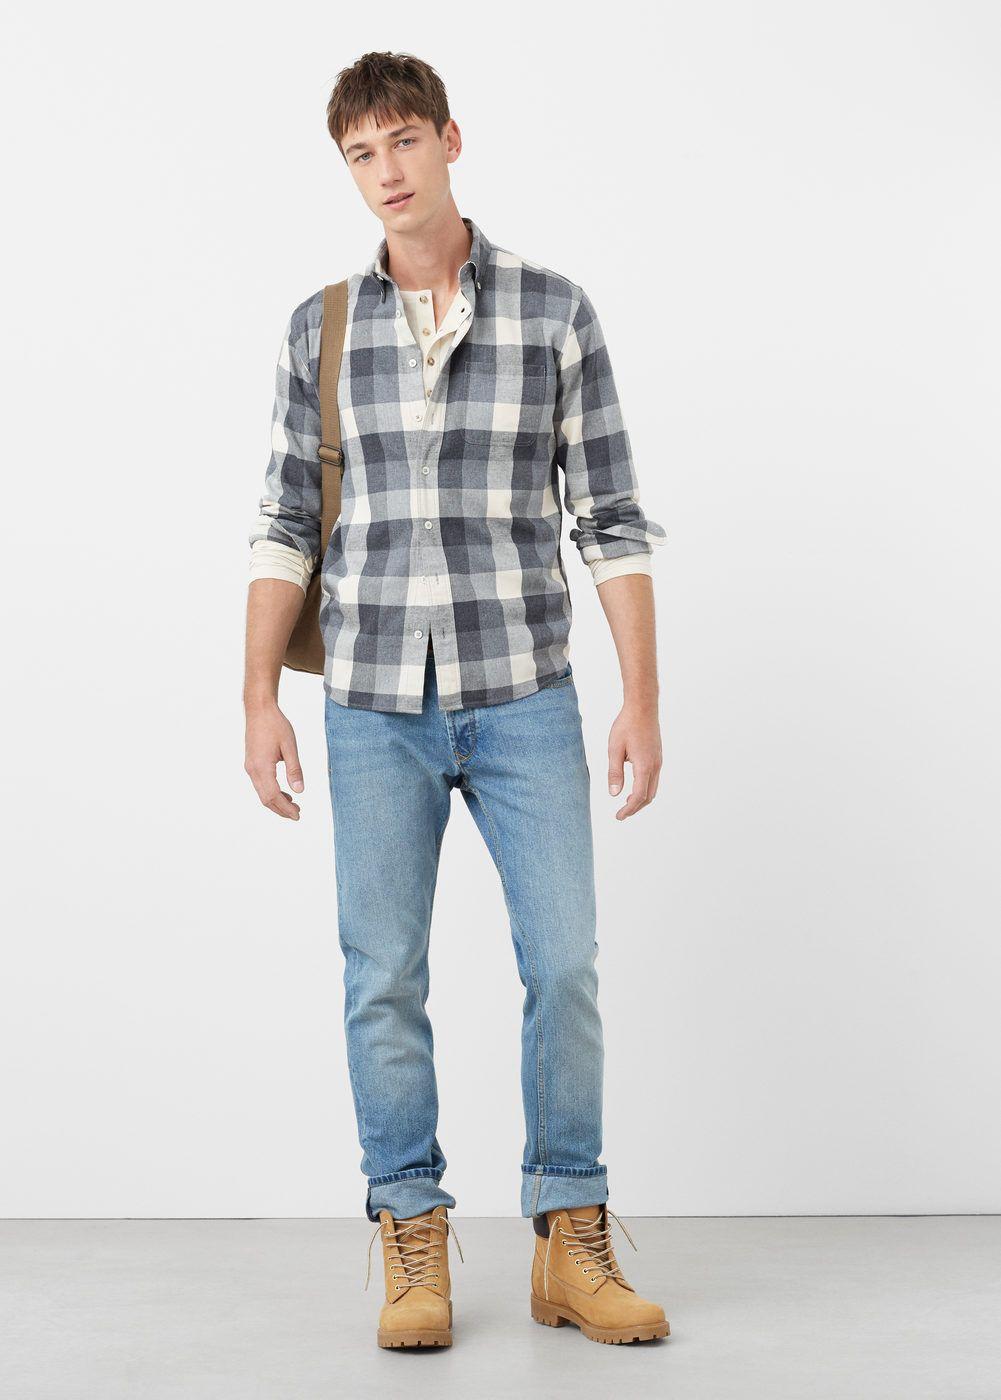 Flannel shirt and shorts men  Slimfit check flannel shirt  Men  Strike a Pose  Pinterest